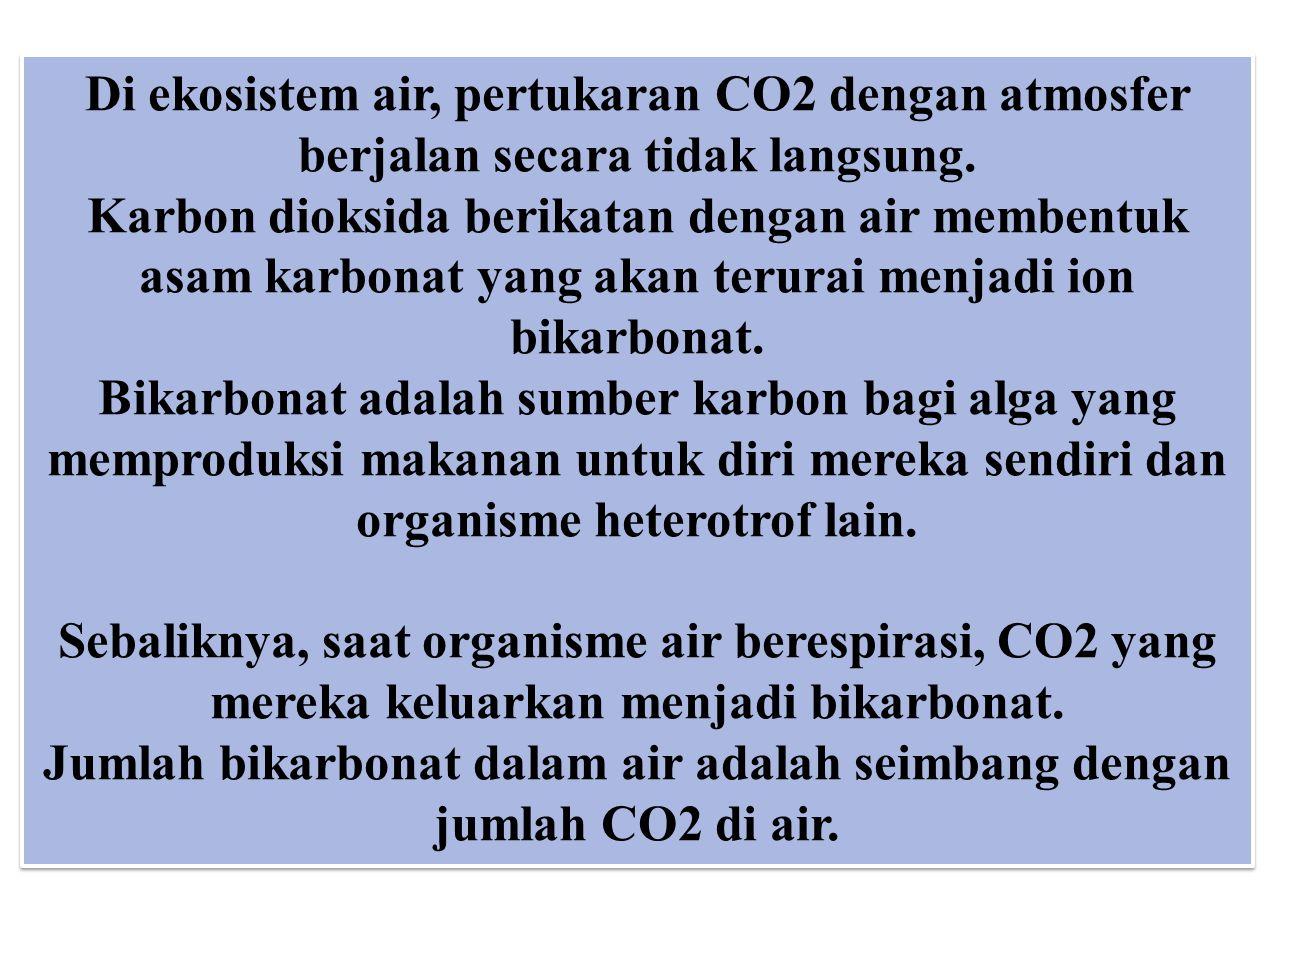 Di ekosistem air, pertukaran CO2 dengan atmosfer berjalan secara tidak langsung. Karbon dioksida berikatan dengan air membentuk asam karbonat yang aka